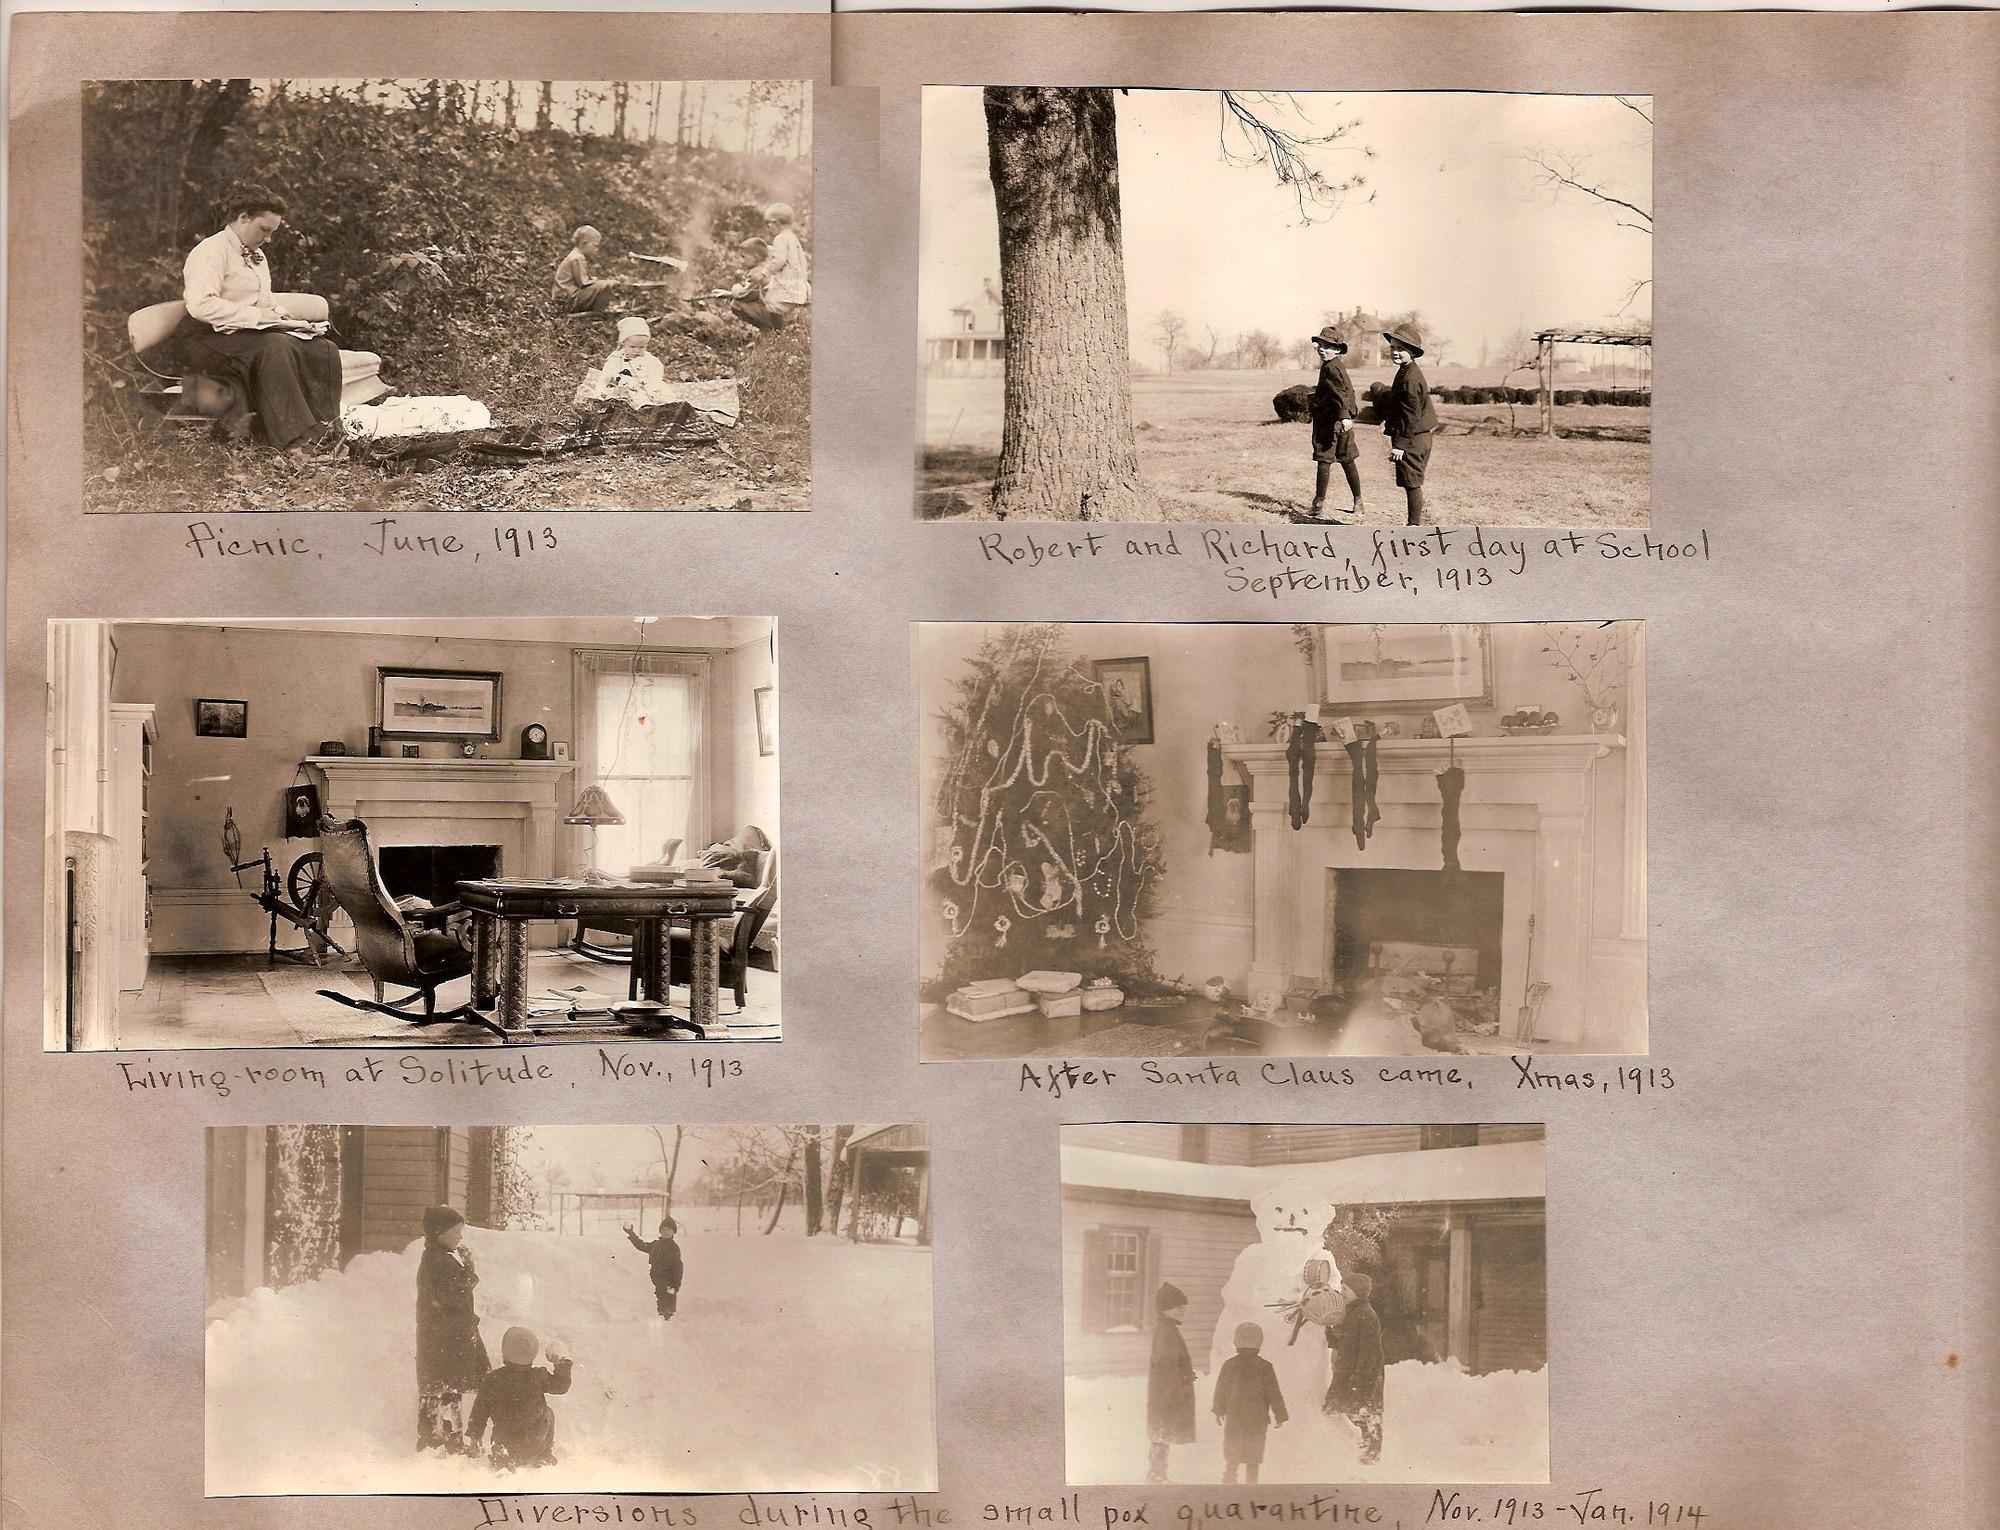 Fletcher_RFletcherPhotos_ScrapbookPage08_1913-1914.jpg